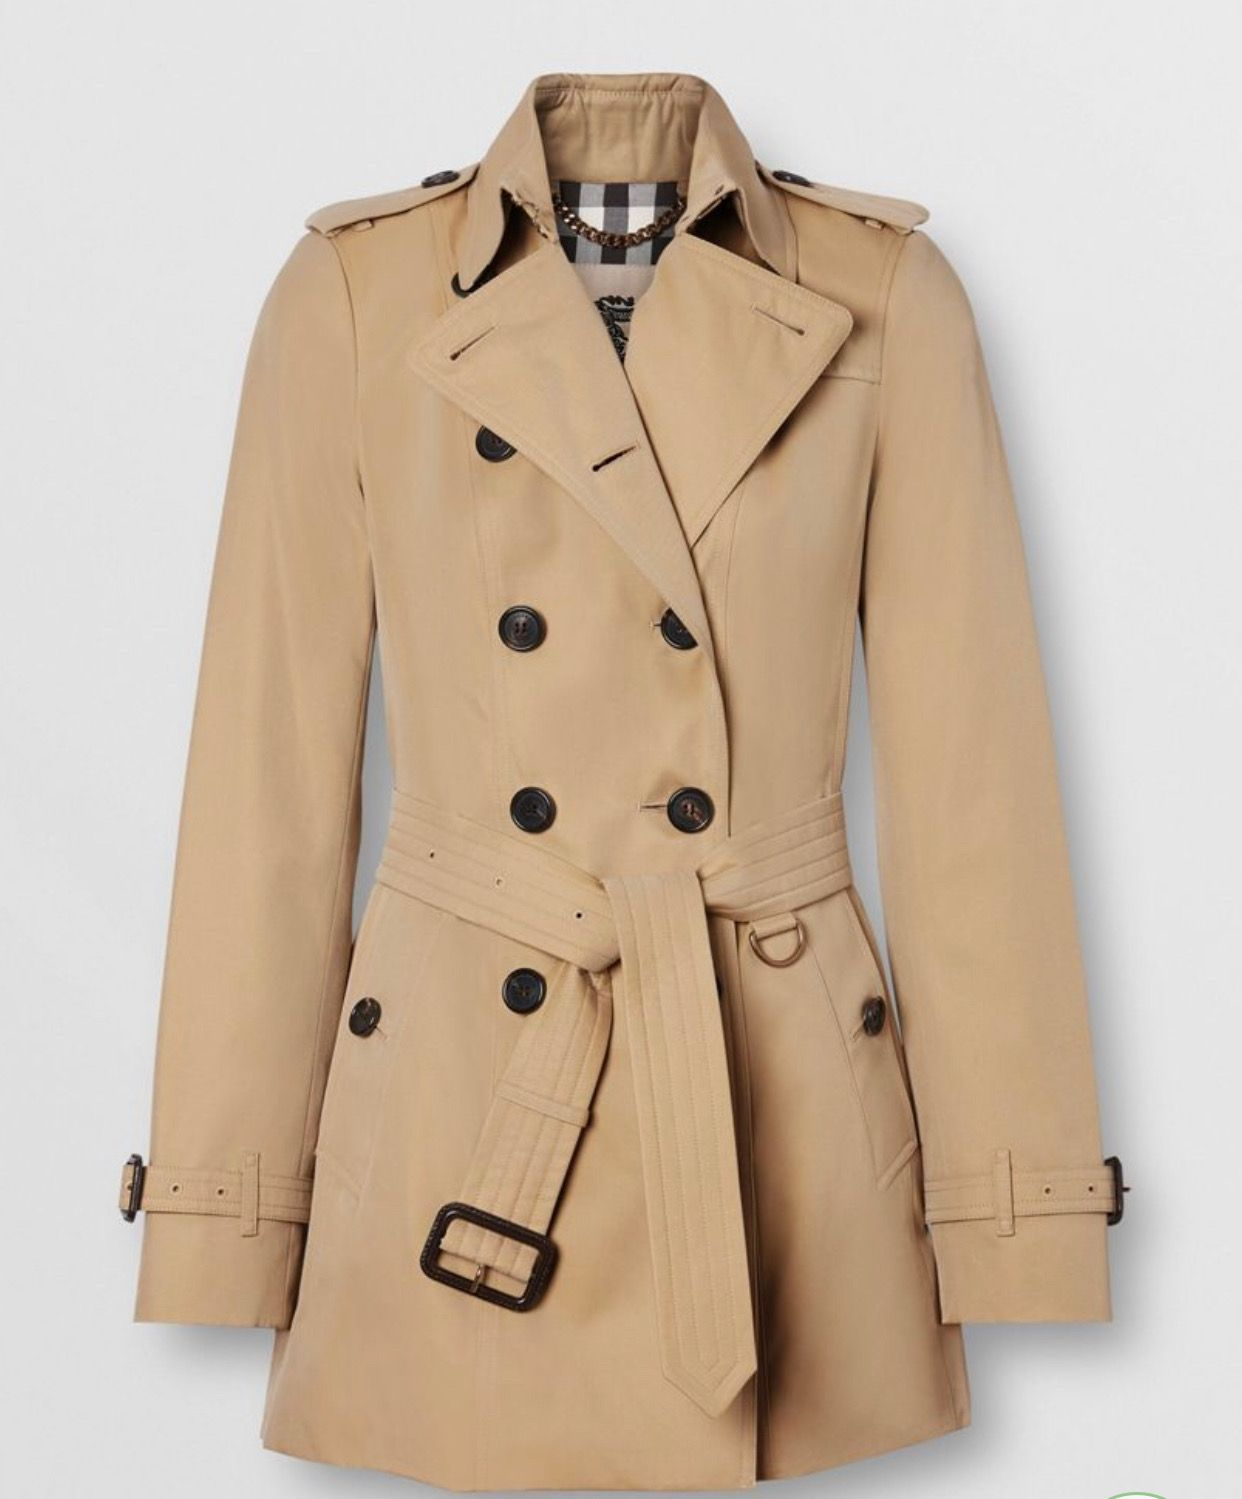 Burberry Jacket Burberry Trench Coat Short Short Trench Coat Trench Coat